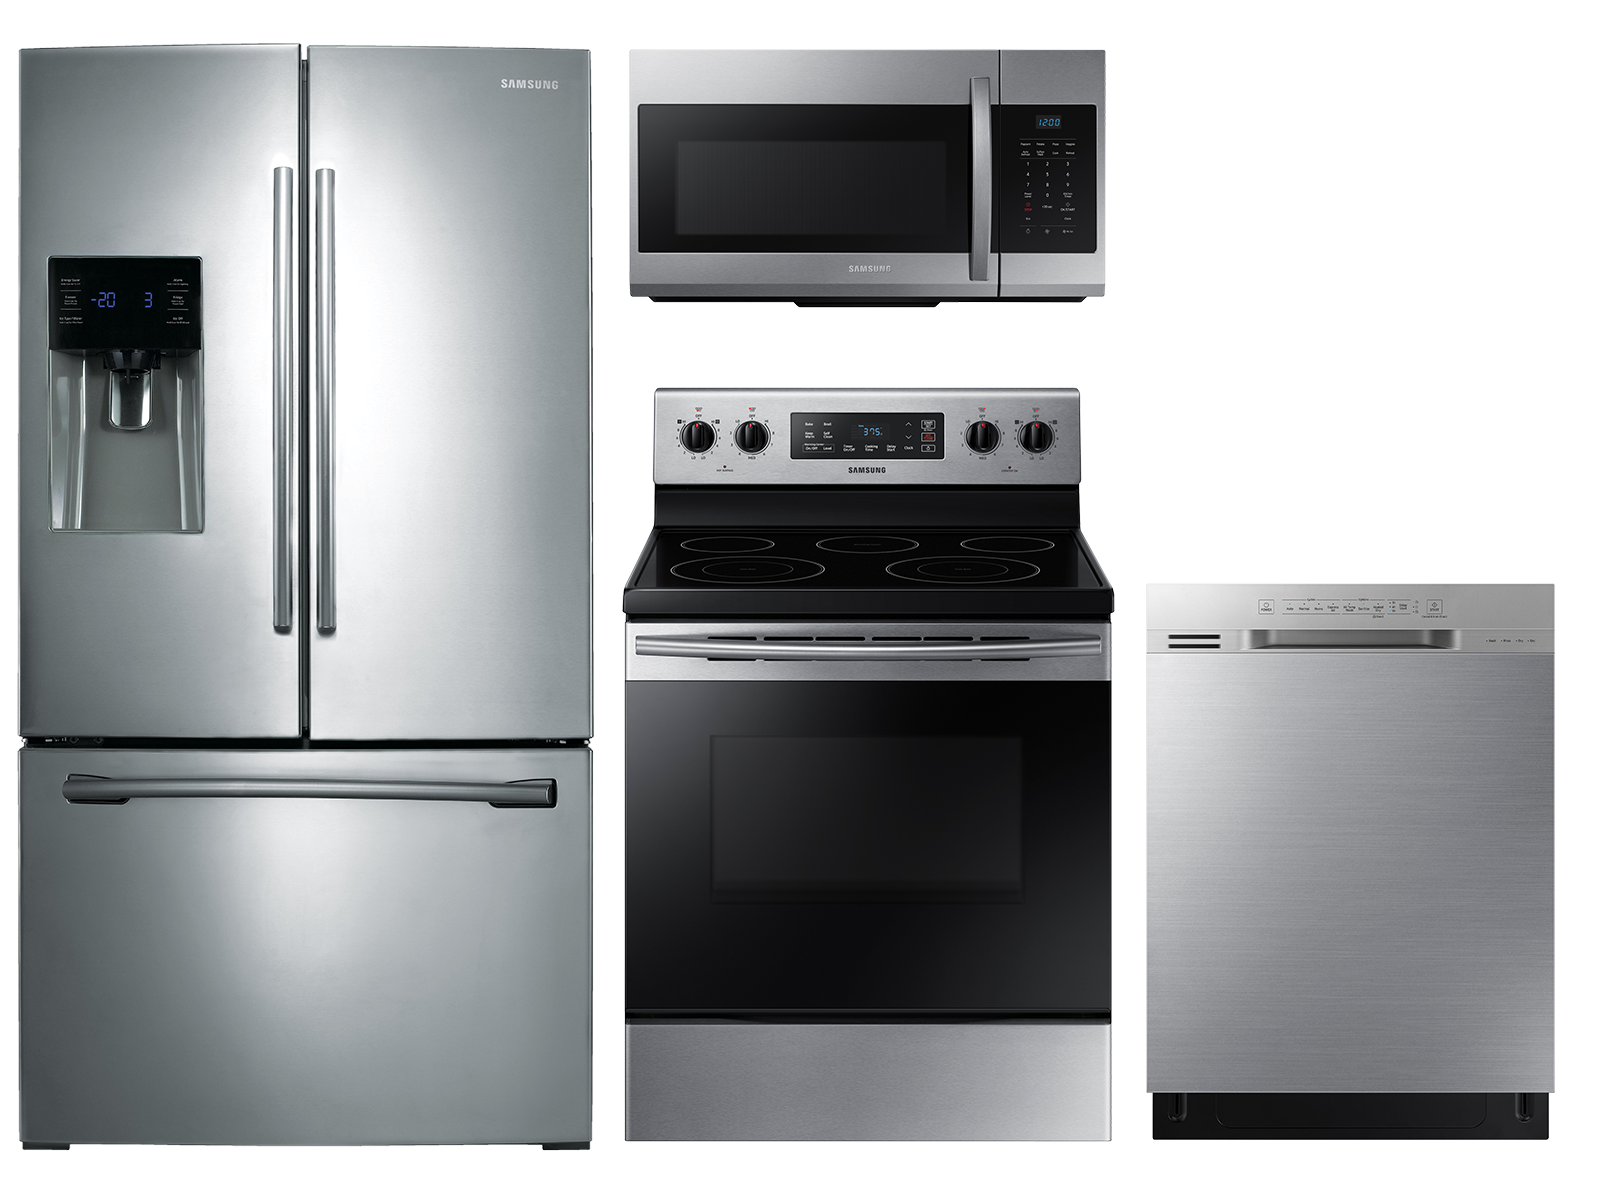 Home Best Deals Discounts And Coupons Online French Door Refrigerator Electric Range Freestanding Electric Ranges